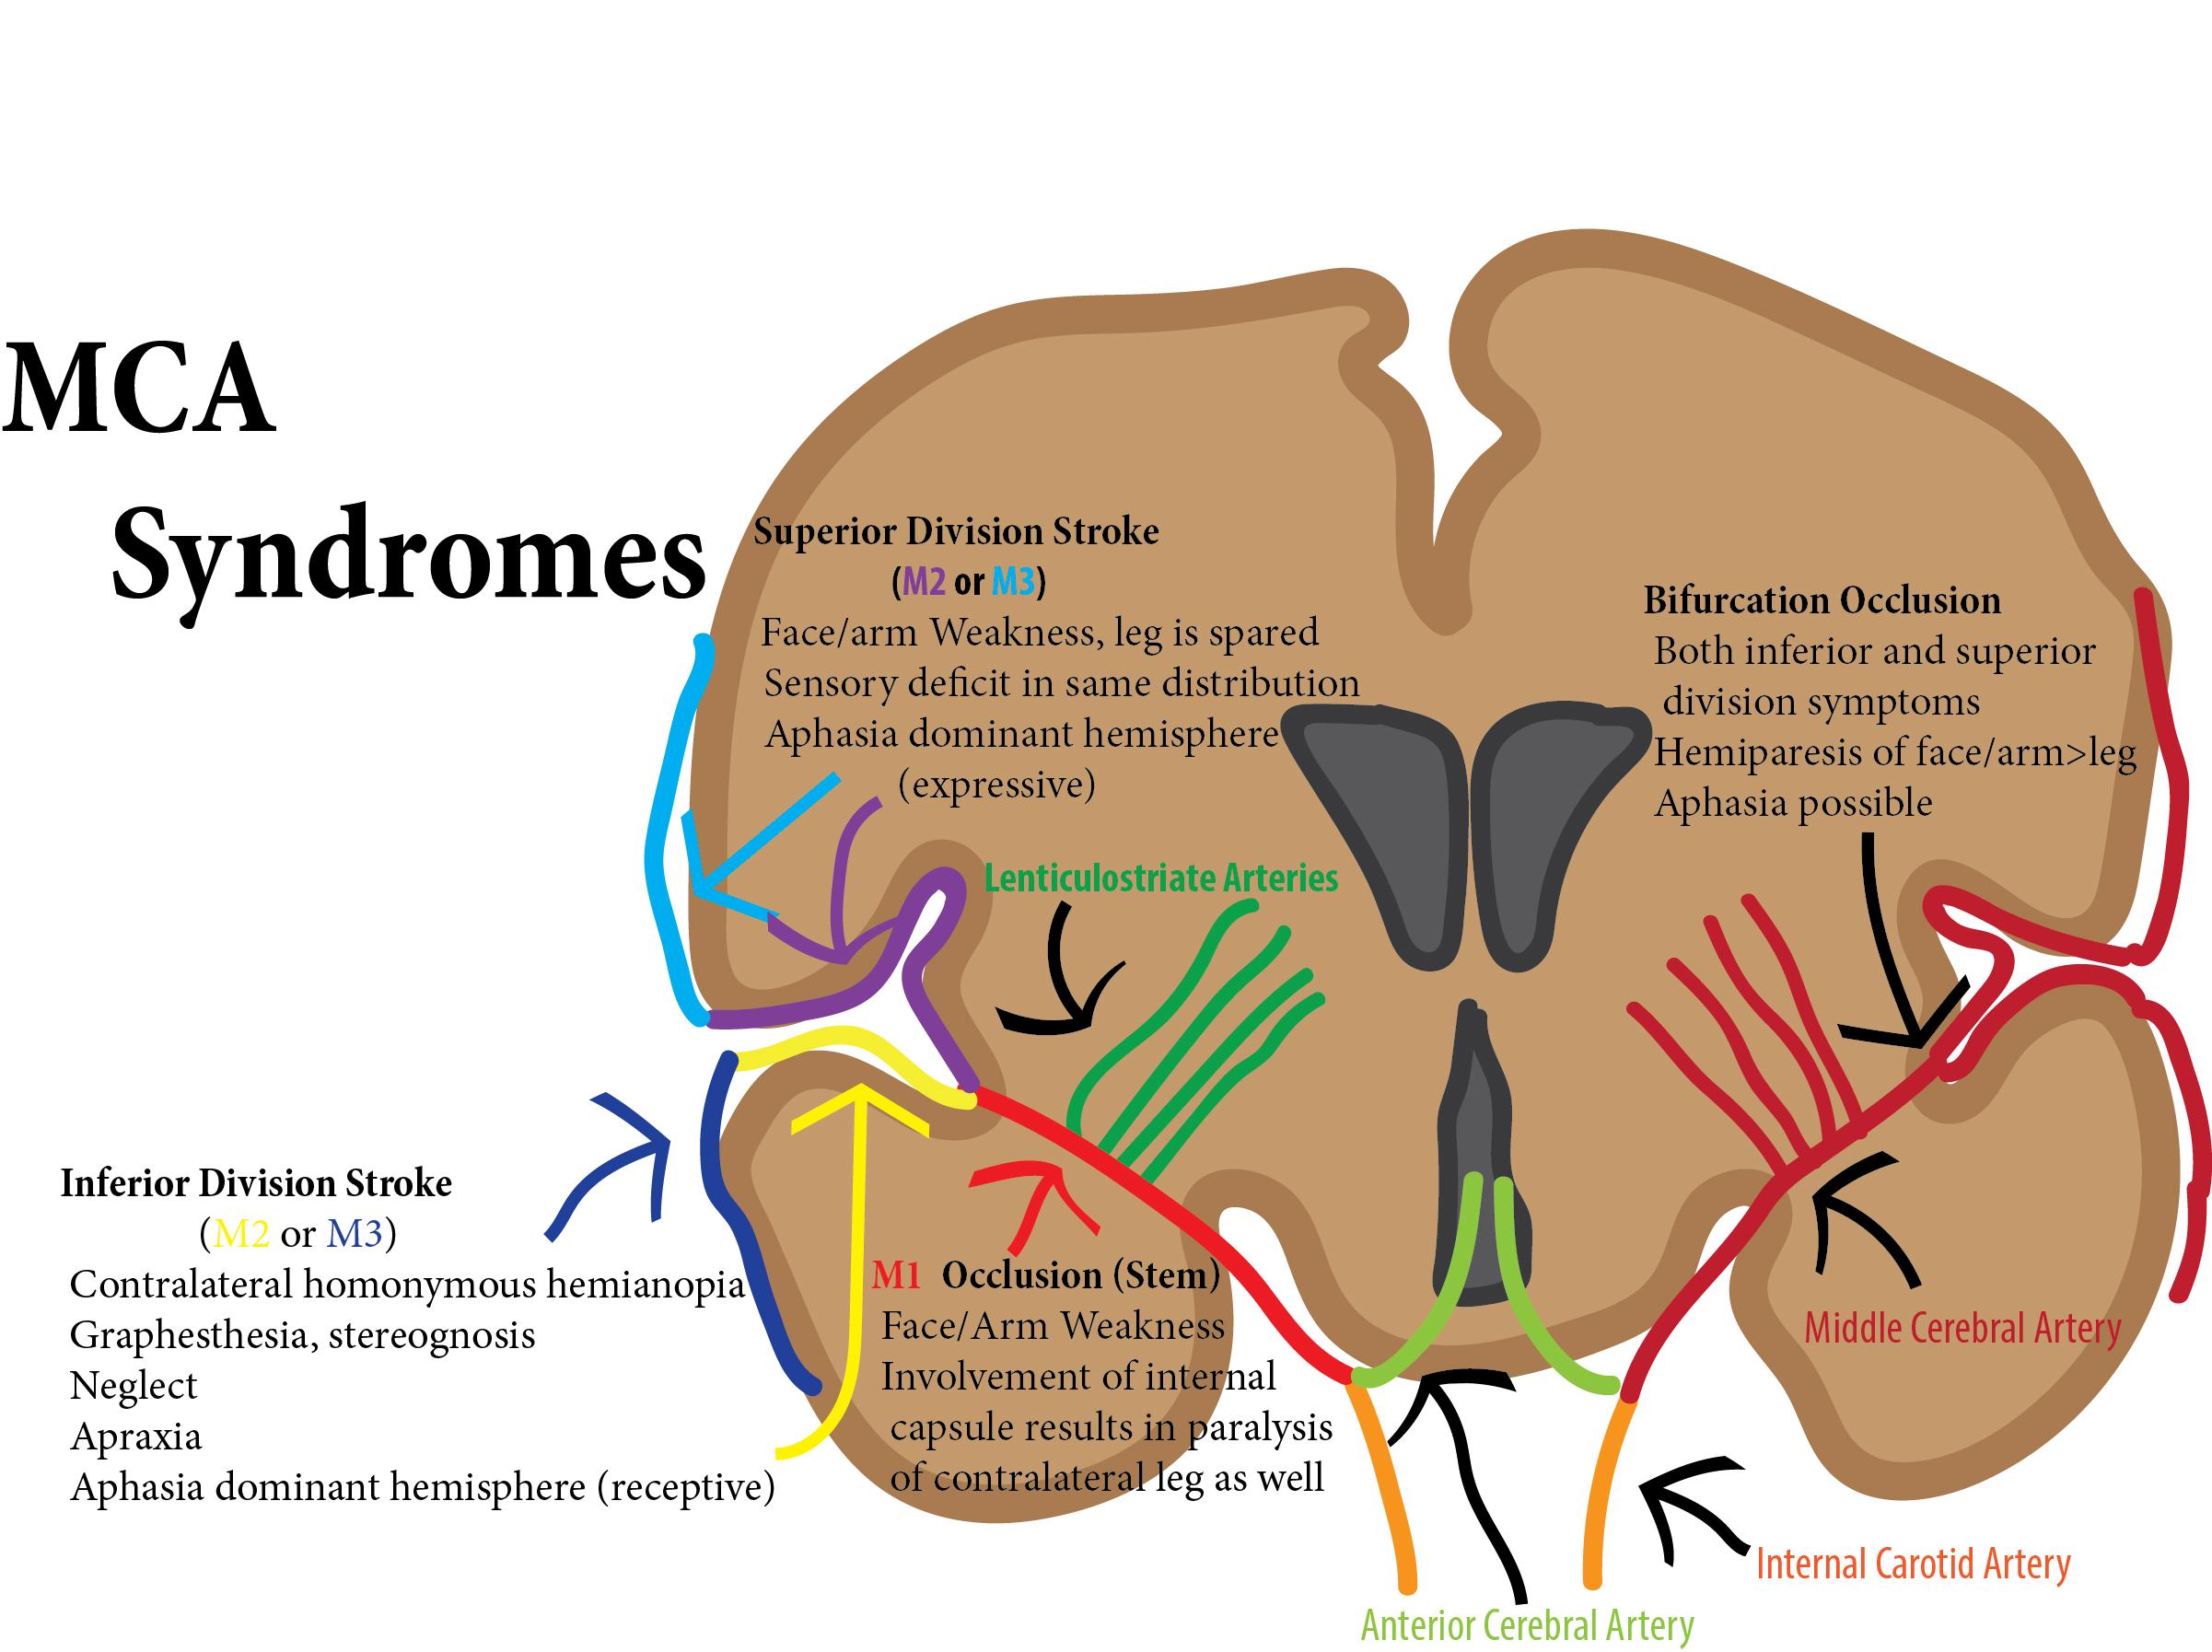 MCA syndromes.jpg